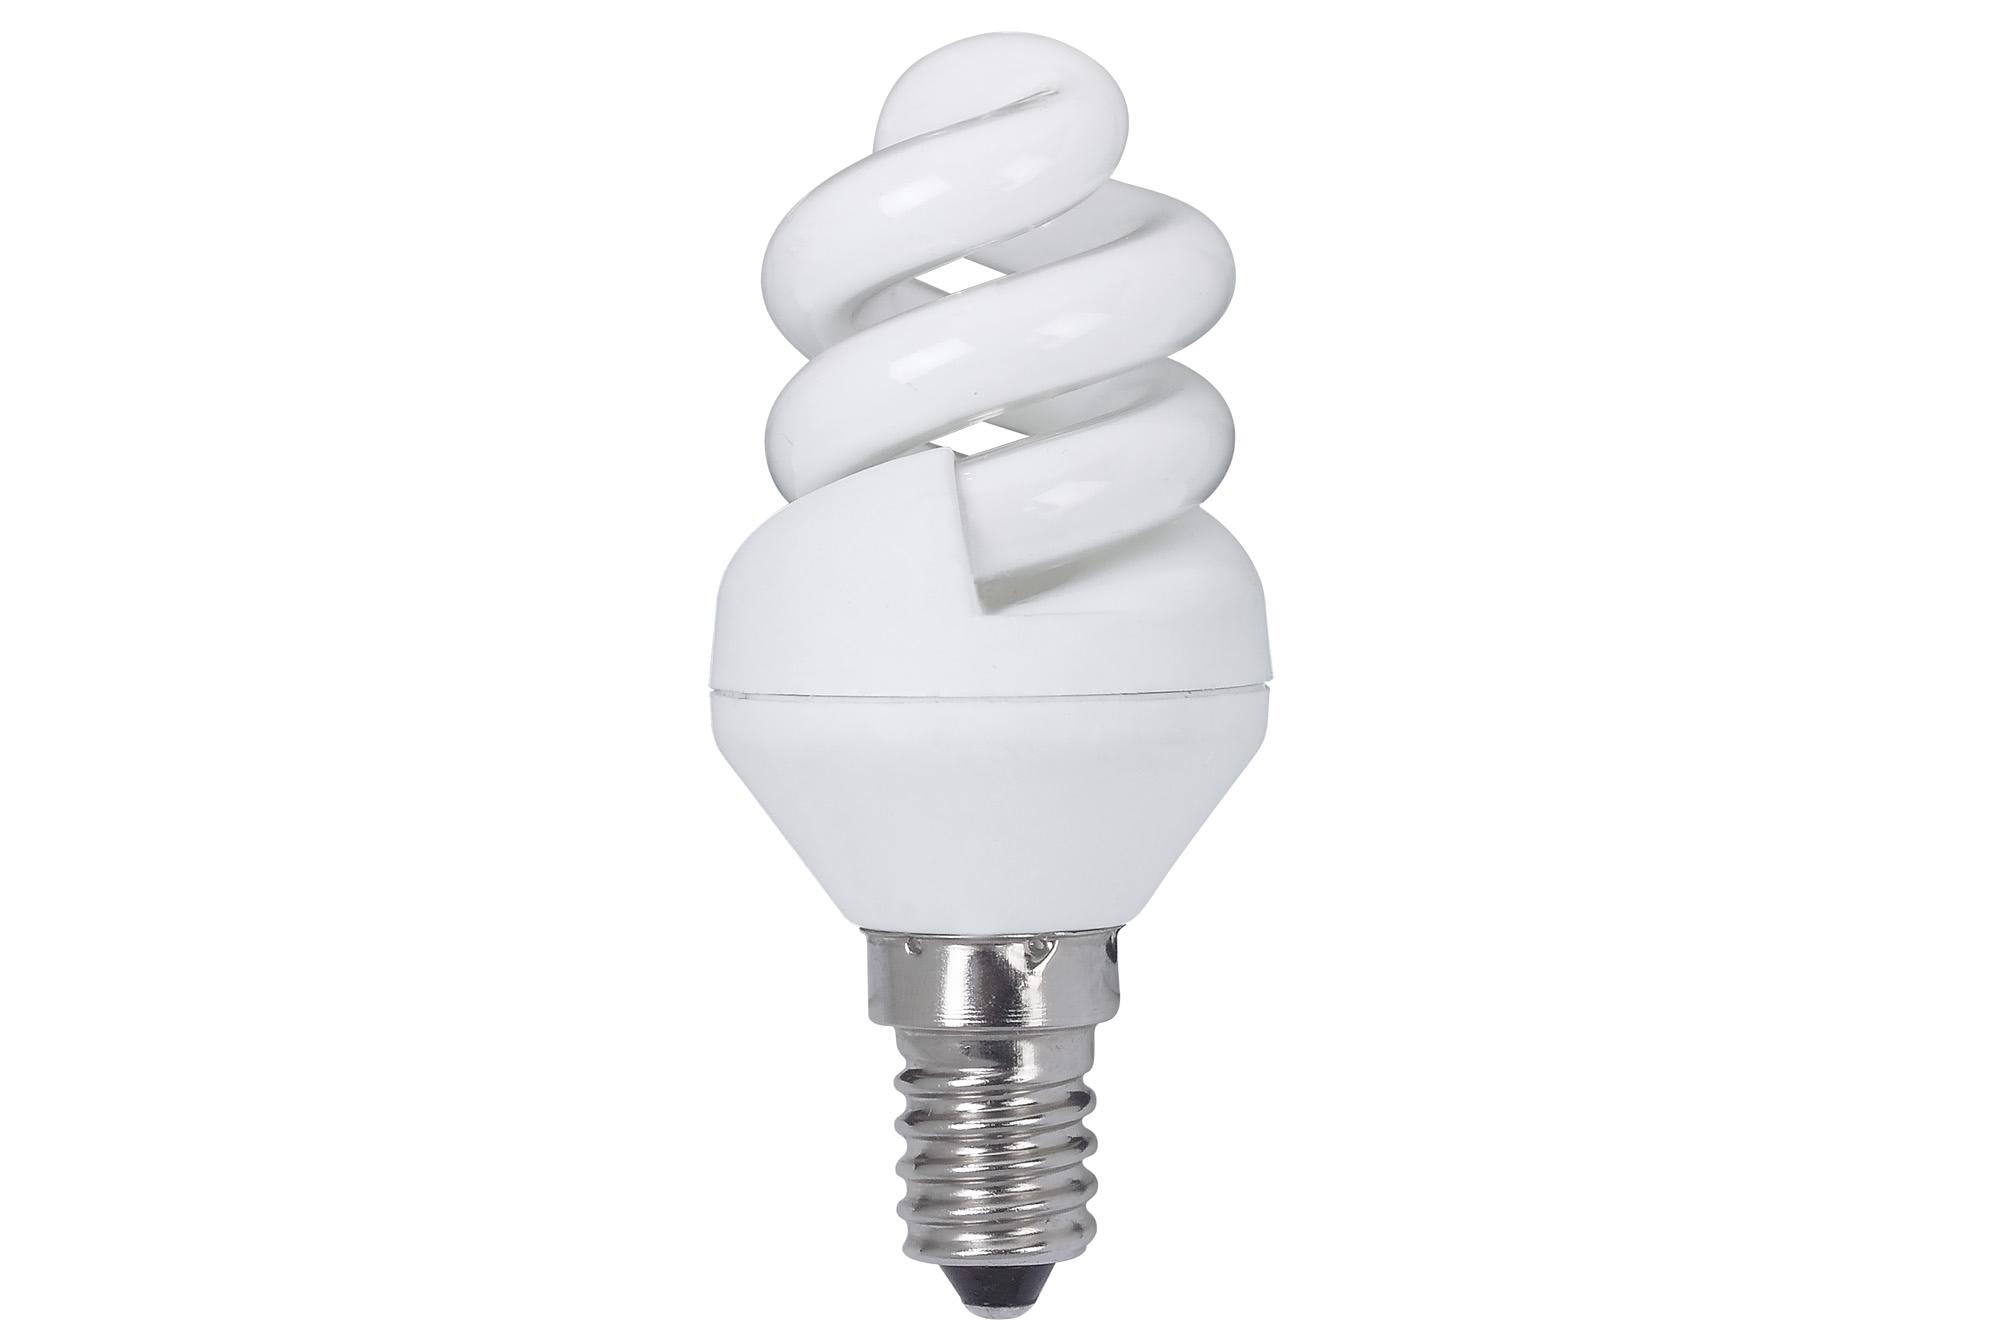 Paulmann. 89434 Лампа энергосберегающая, спираль 5W E14 теплый бел., экстра